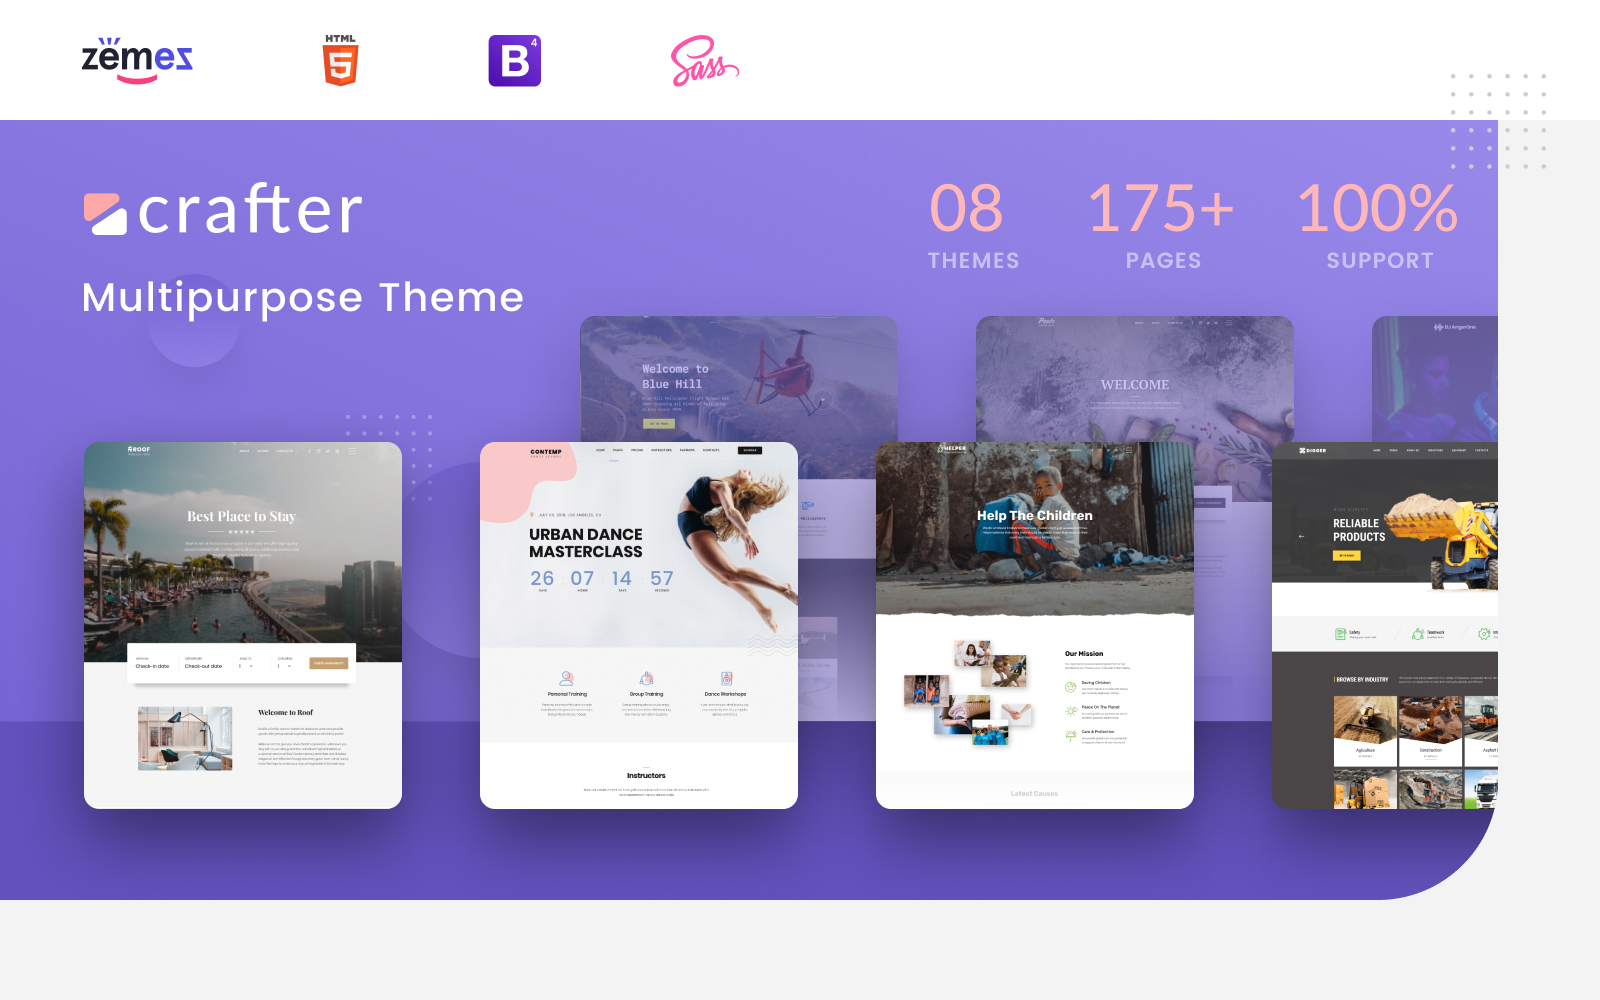 Crafter - Multipurpose Modern Bootstrap 4 Website Template